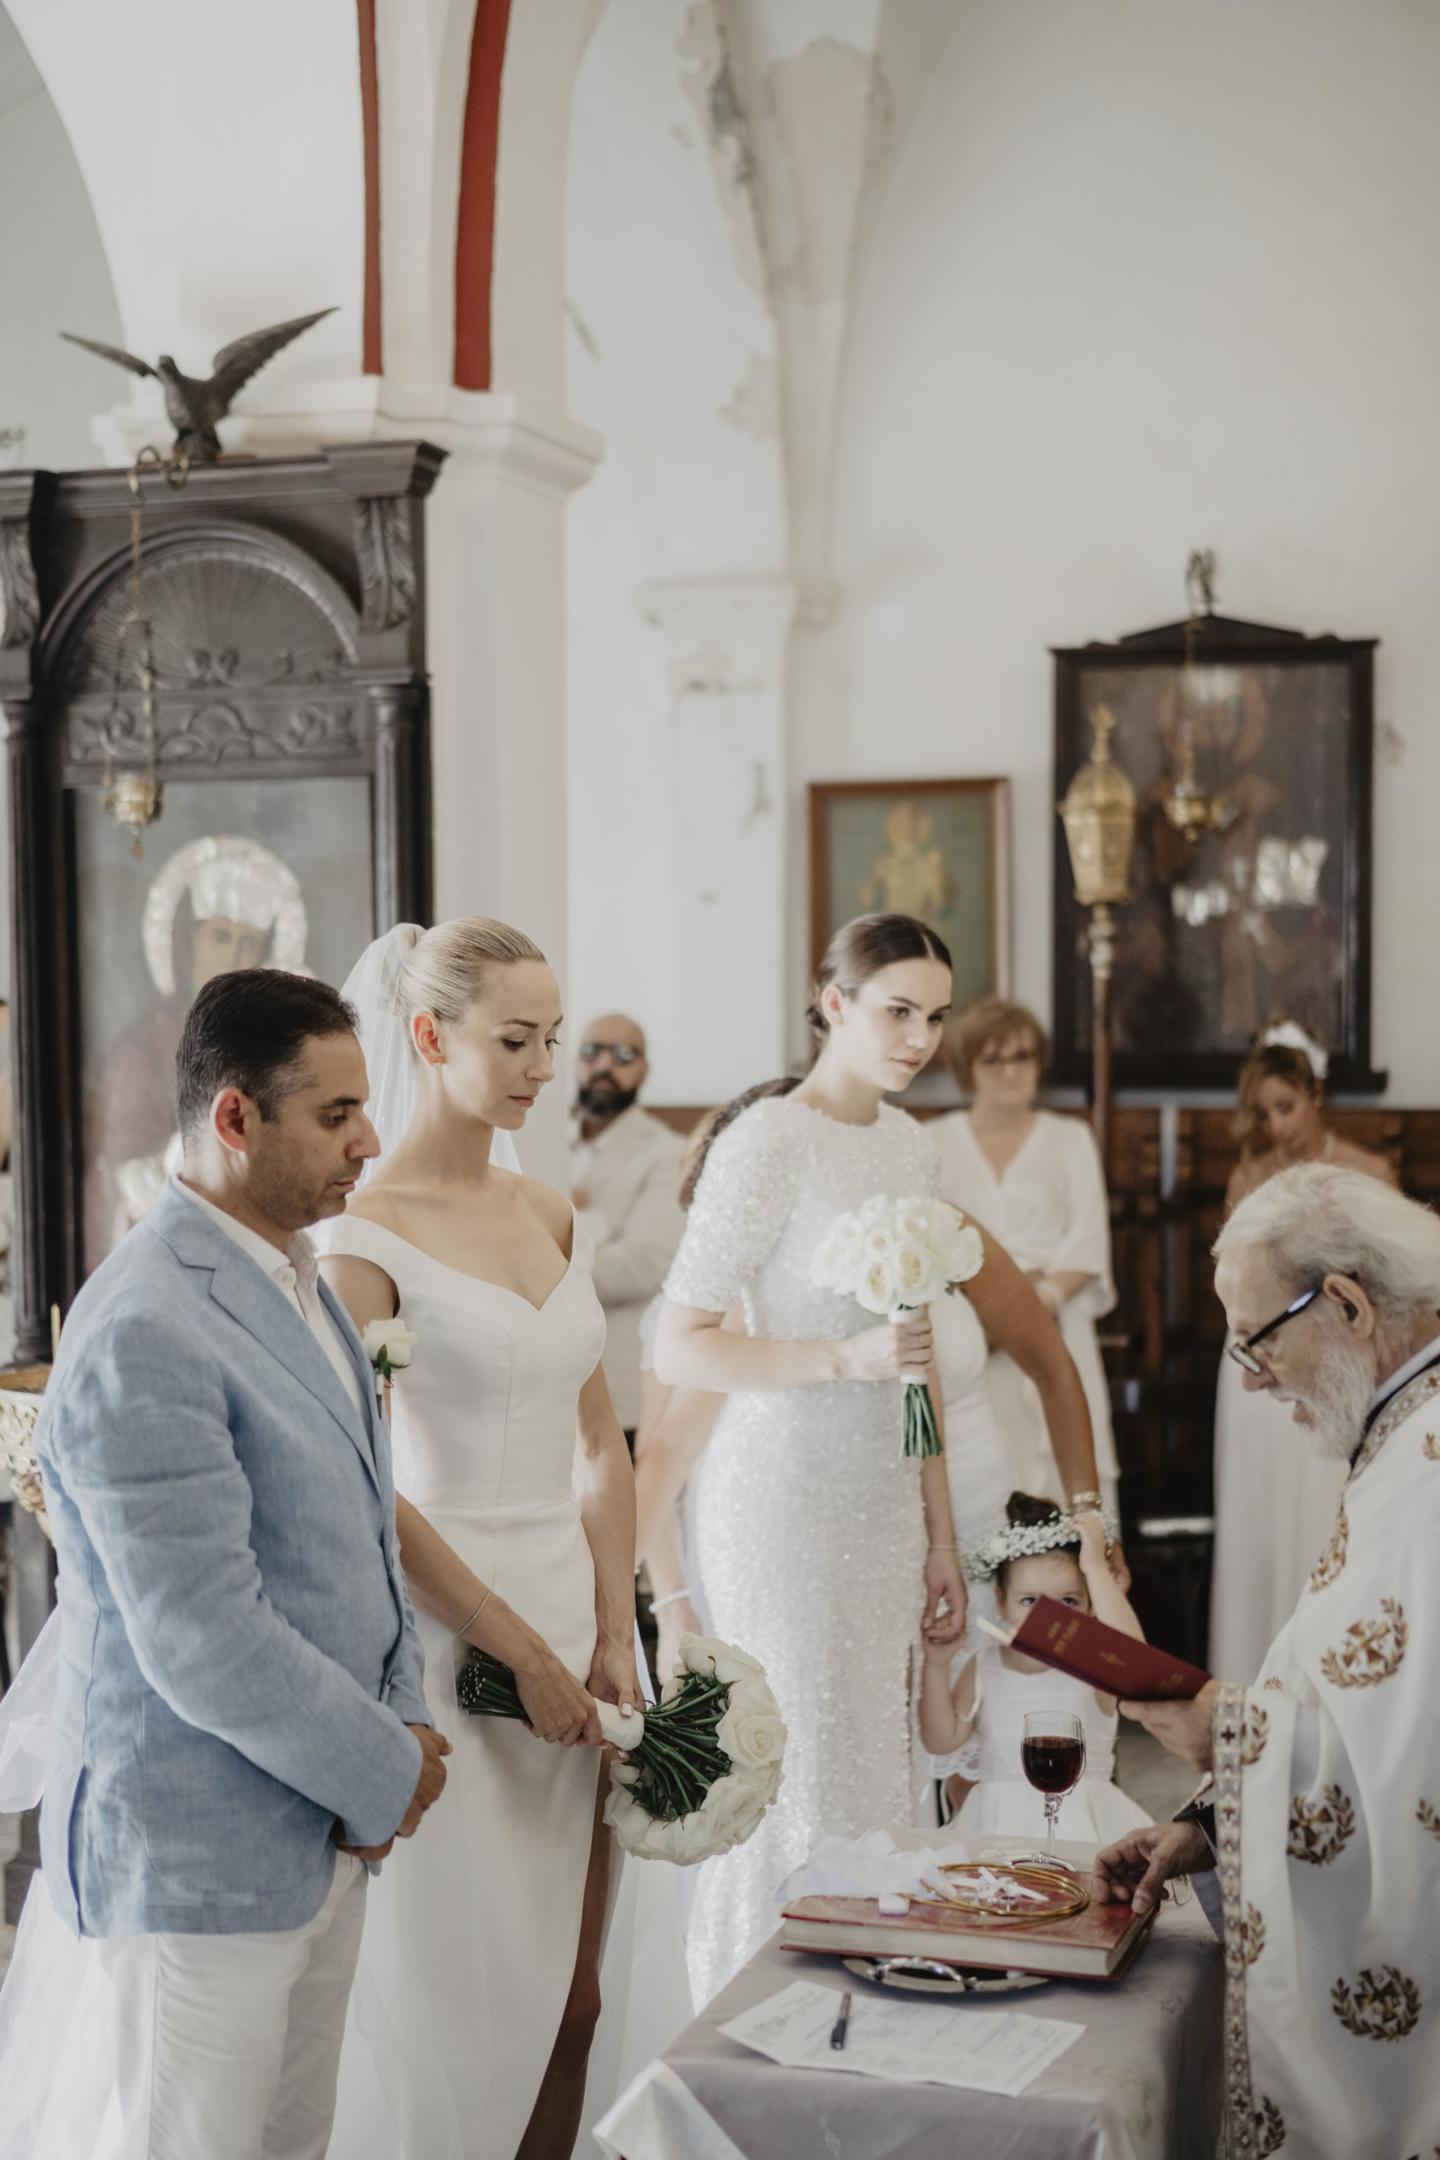 - 30 :: Santorini, a white wedding in a white island :: Luxury wedding photography - 29 ::  - 30